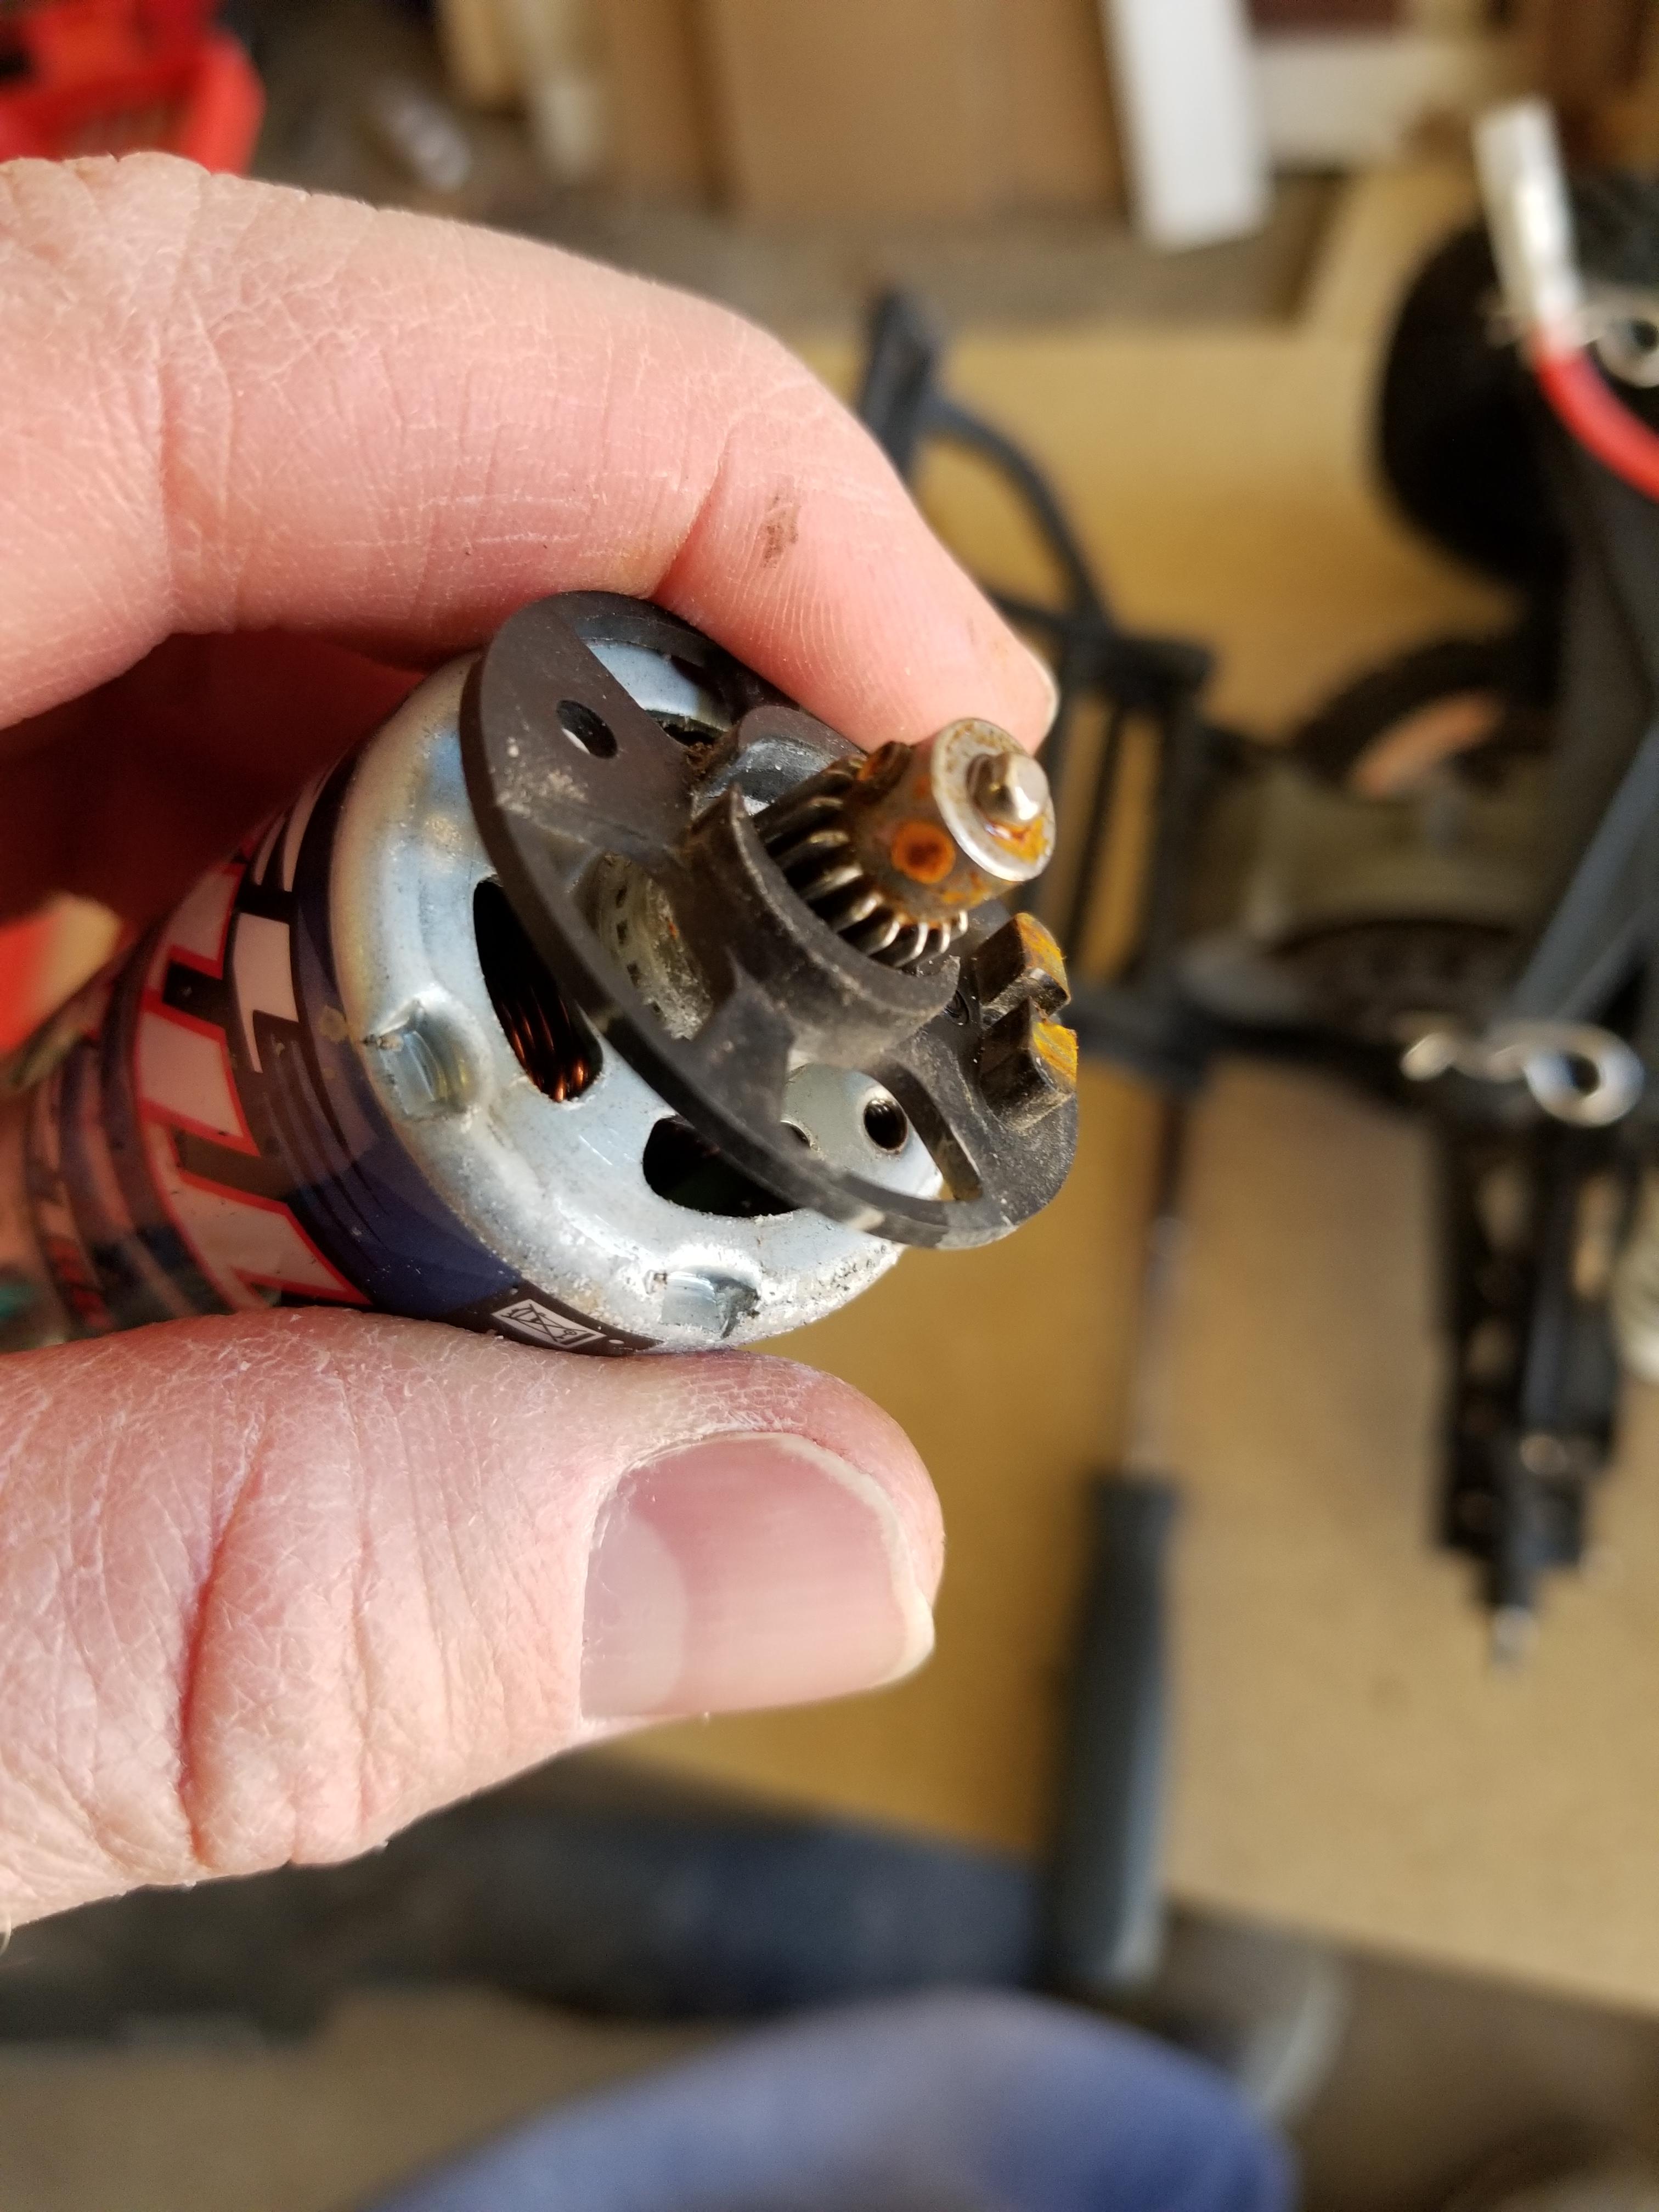 Motor mount plate for a Traxxas Slash